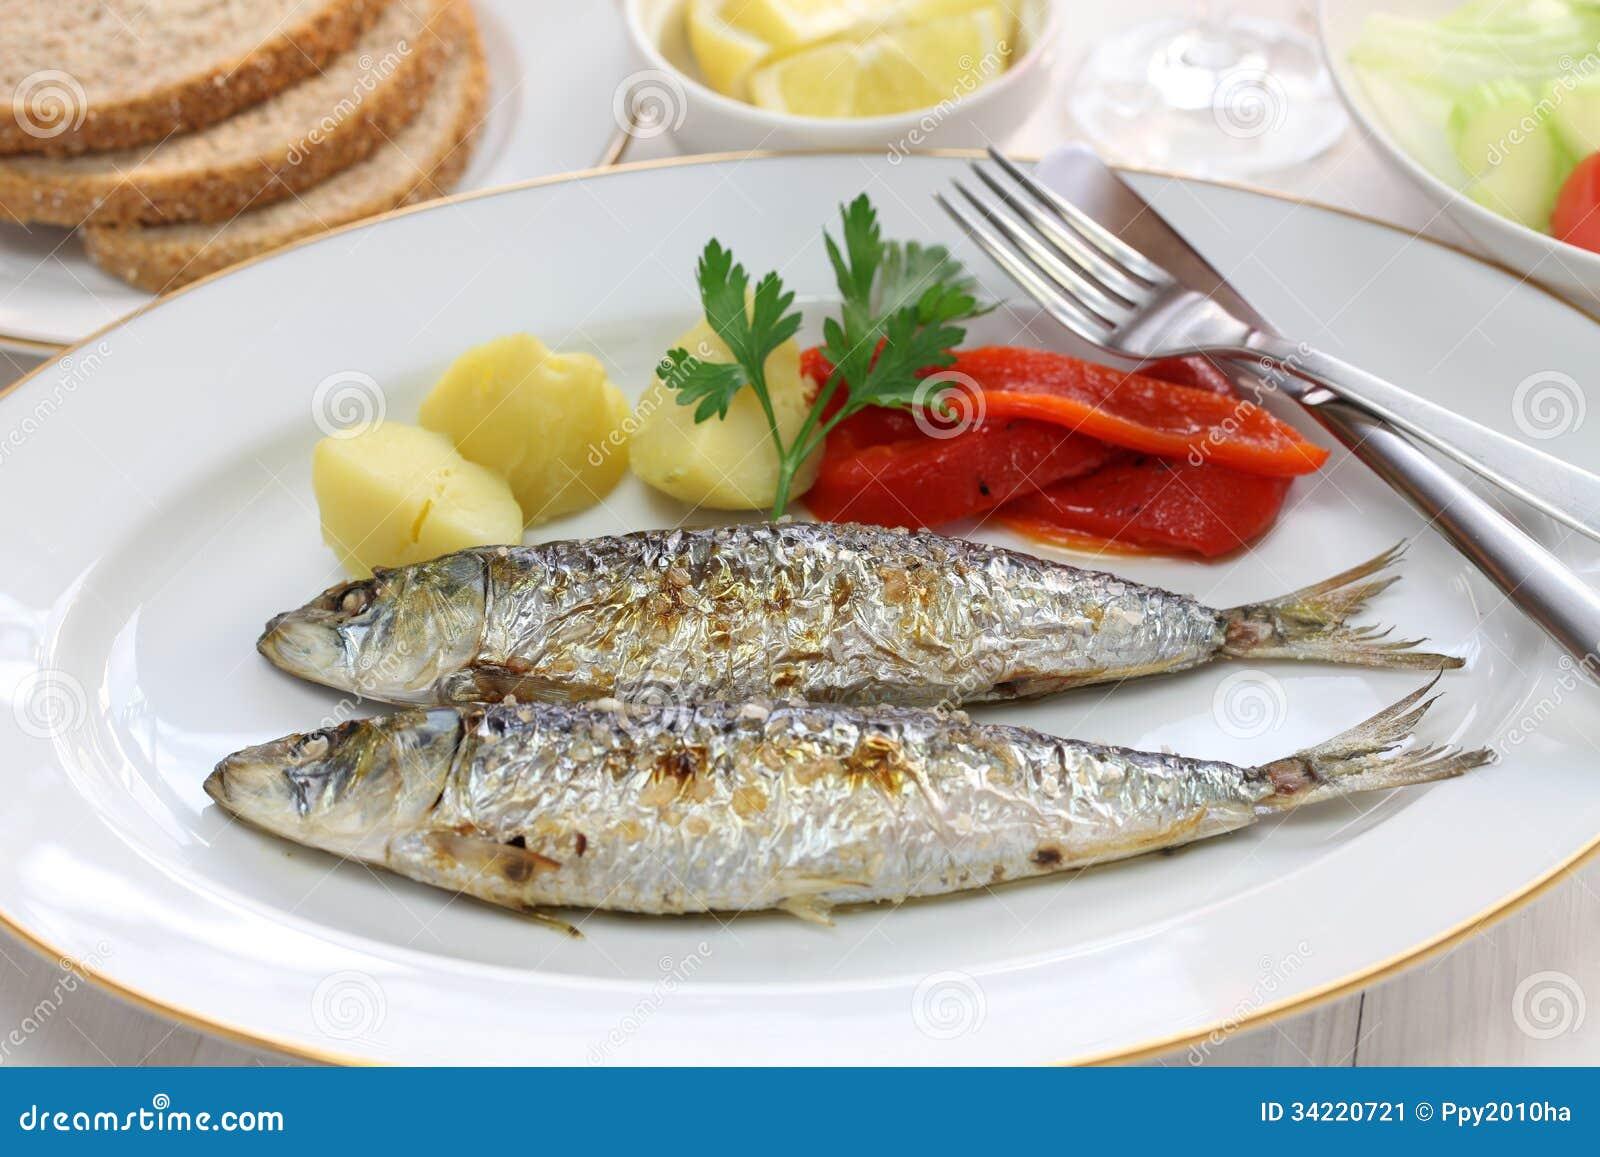 Healthy Portuguese Food